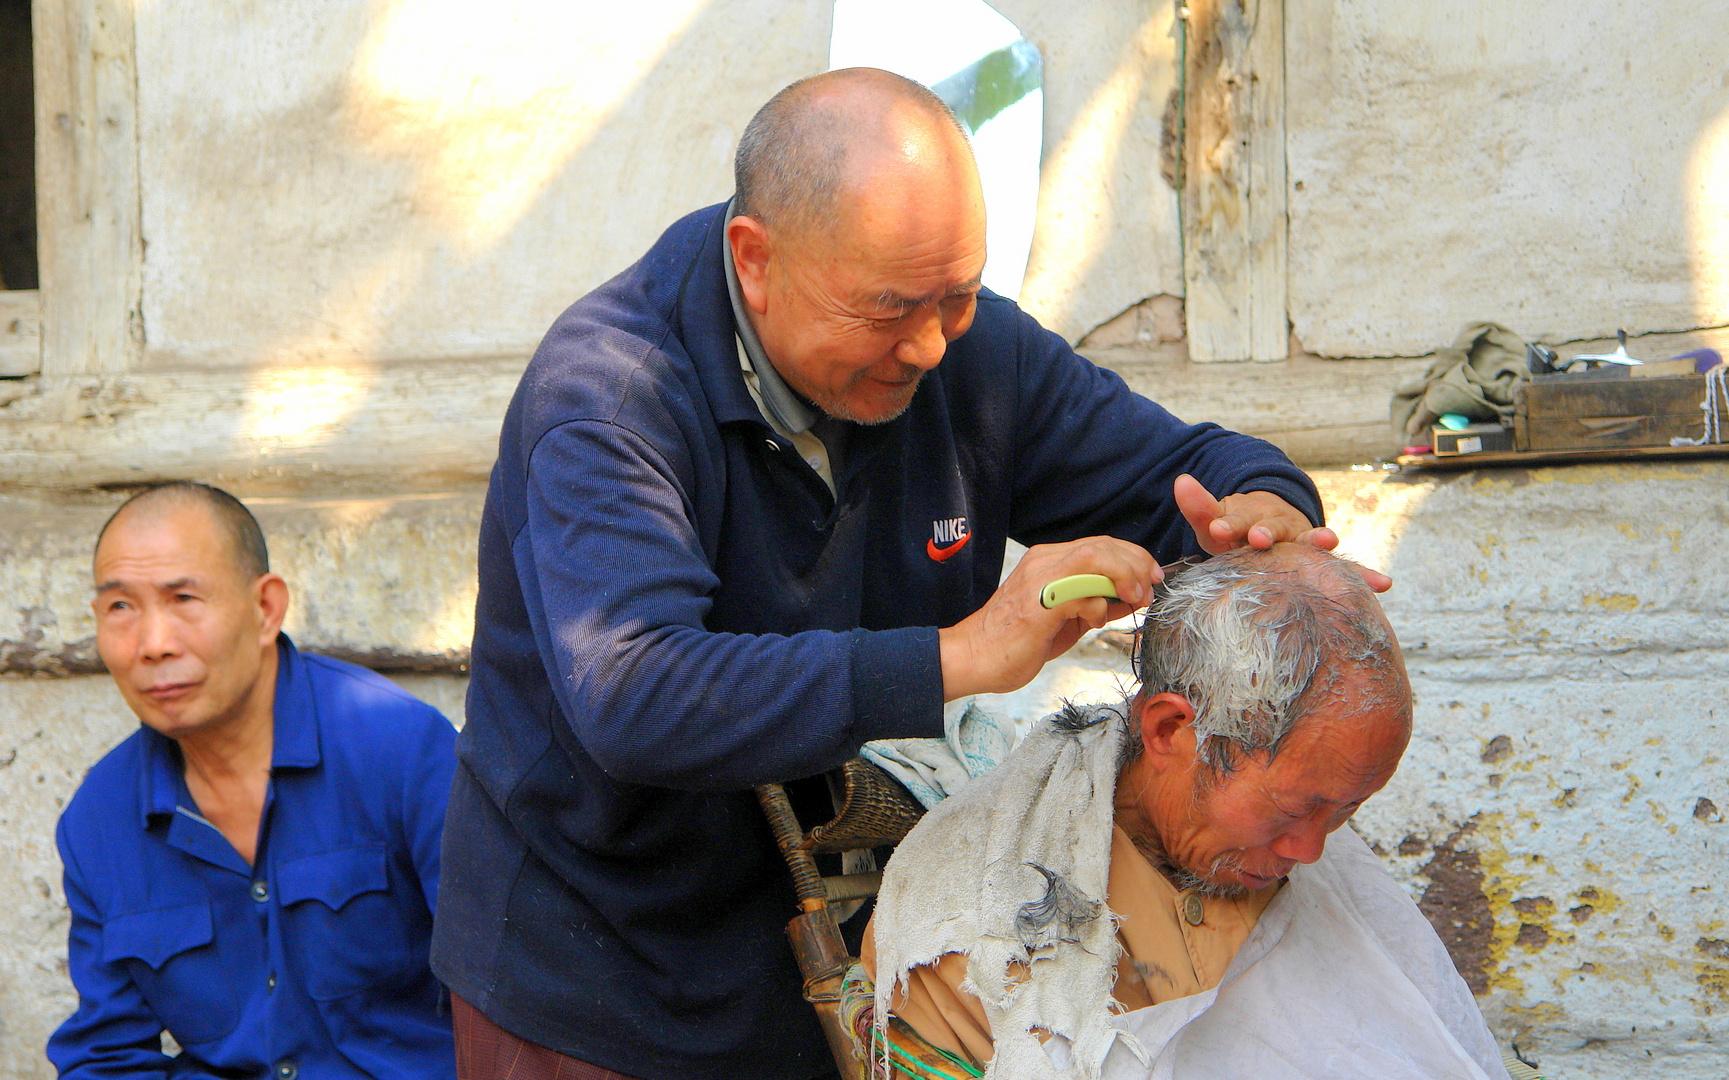 Beim Dorffriseur in Sechuan